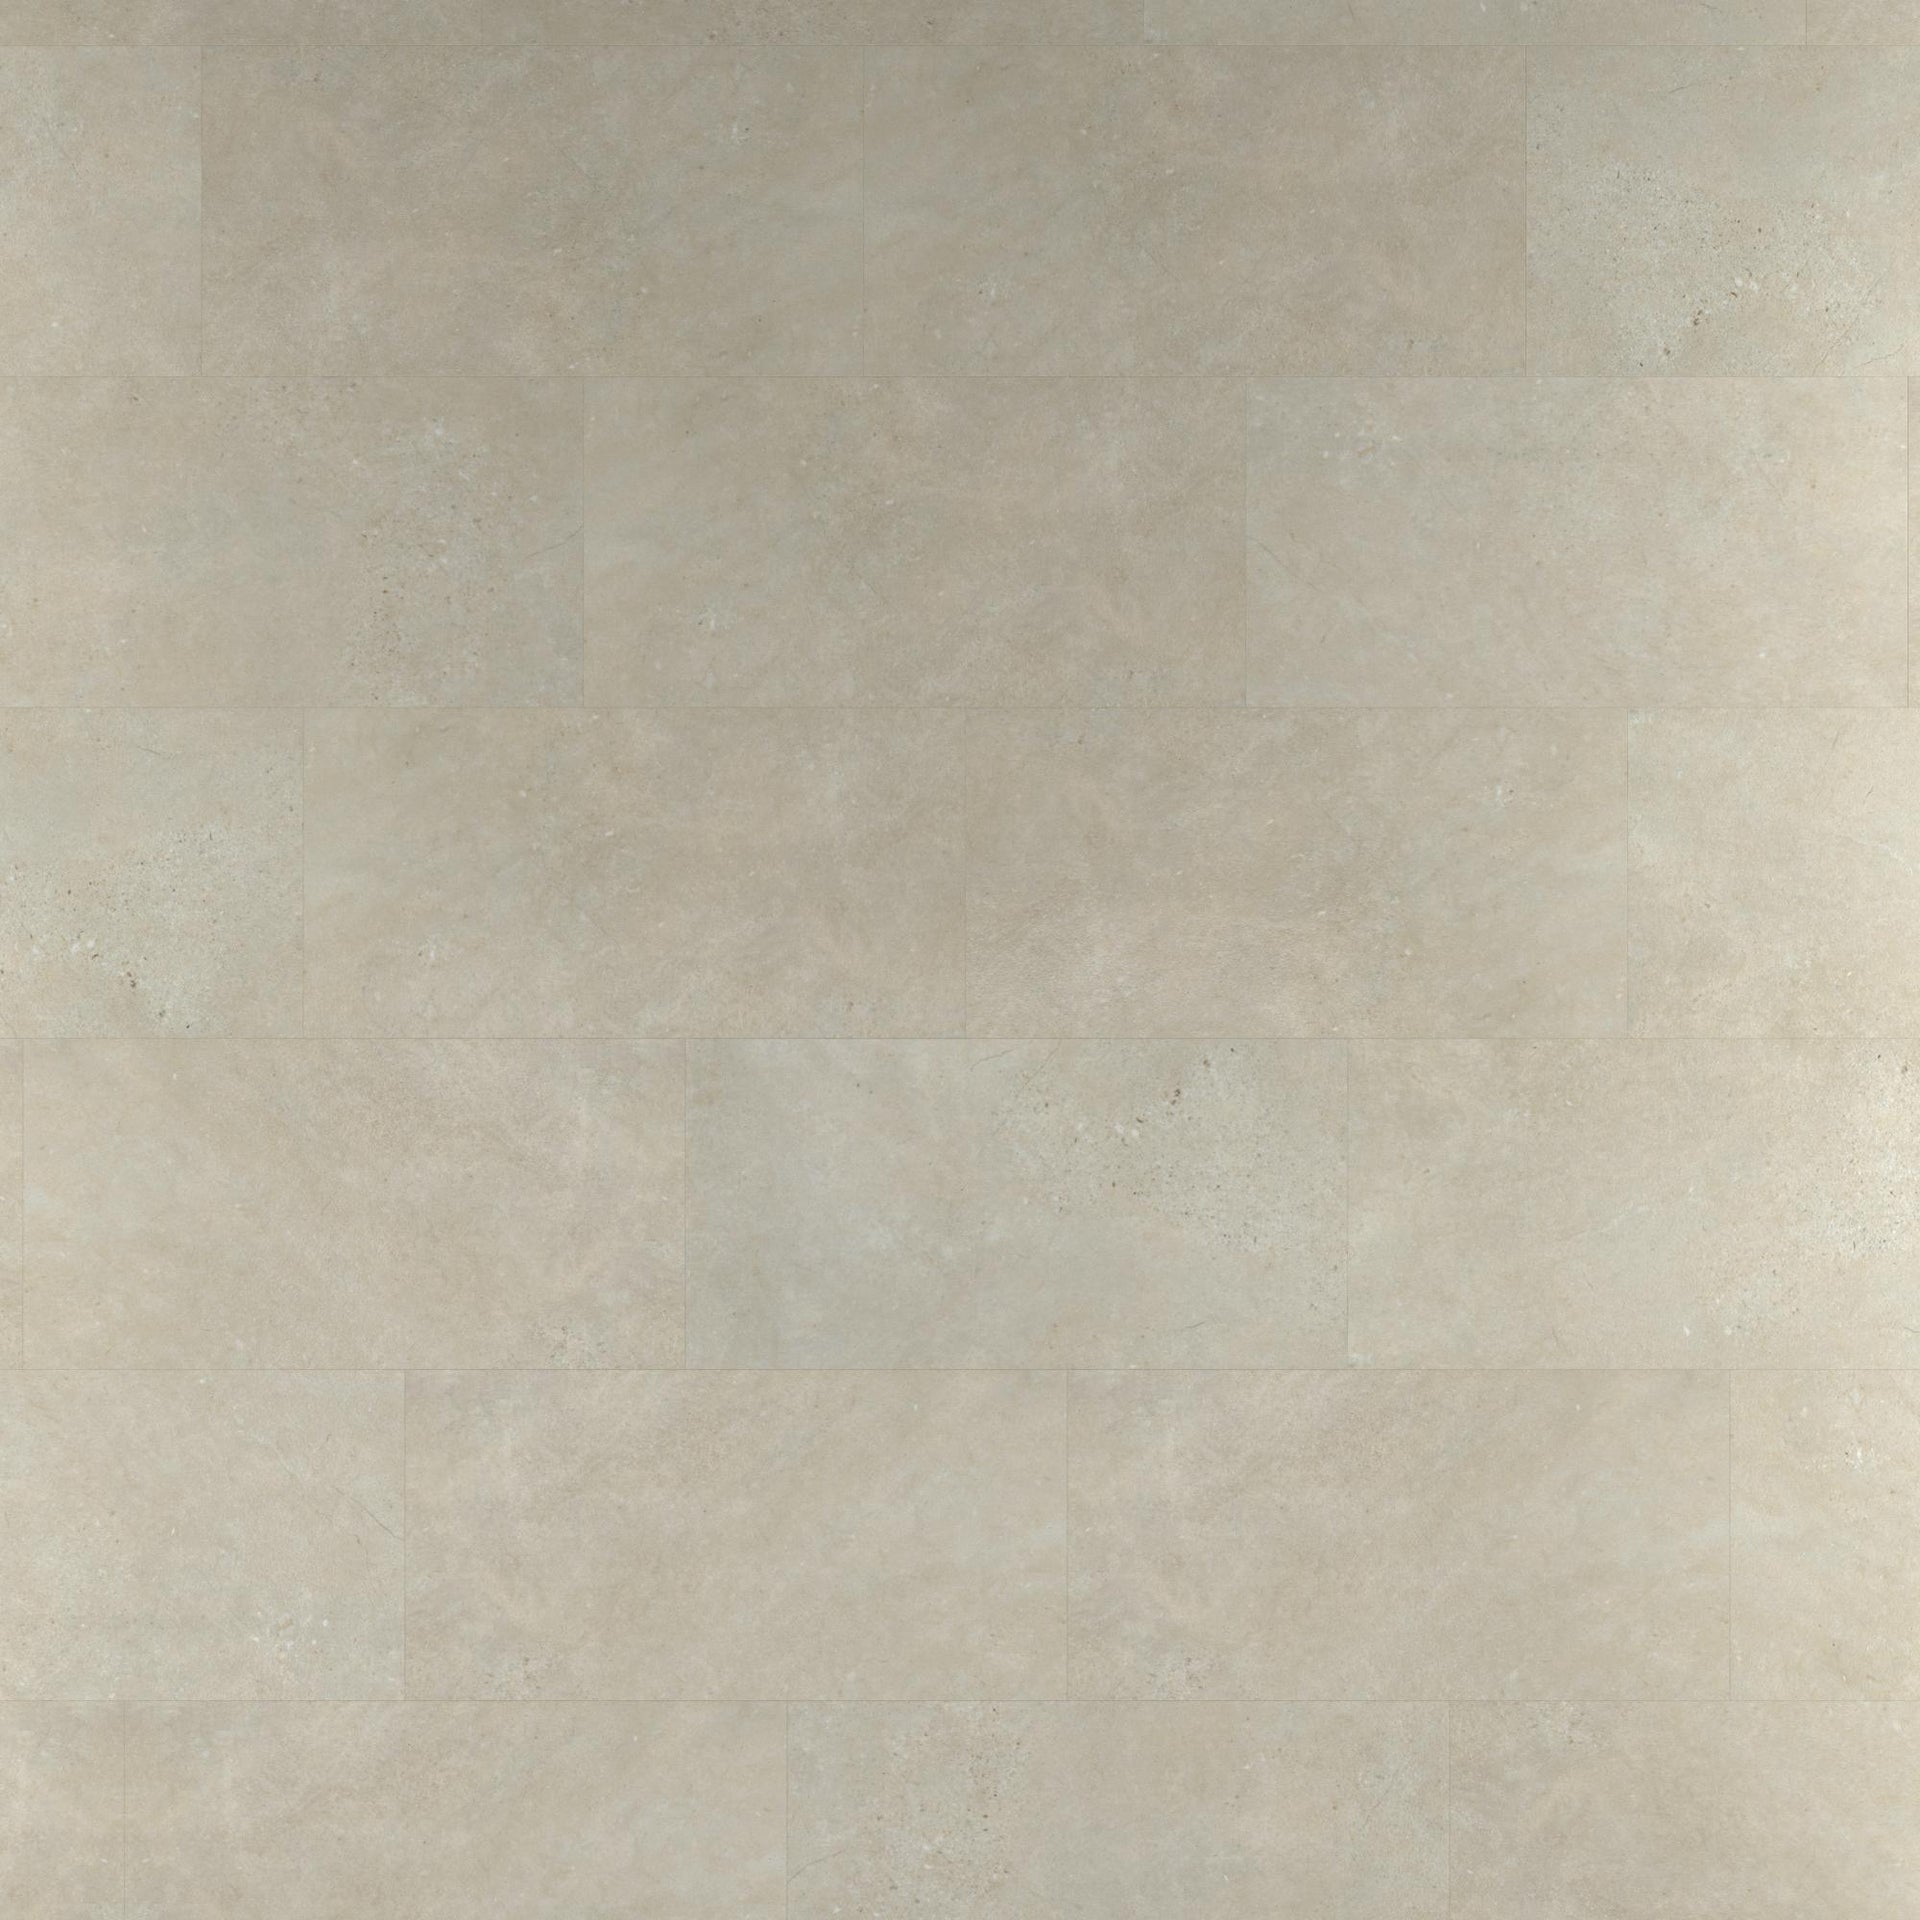 Pavimento PVC adesivo Limestone Sp 2 mm grigio / argento - 11